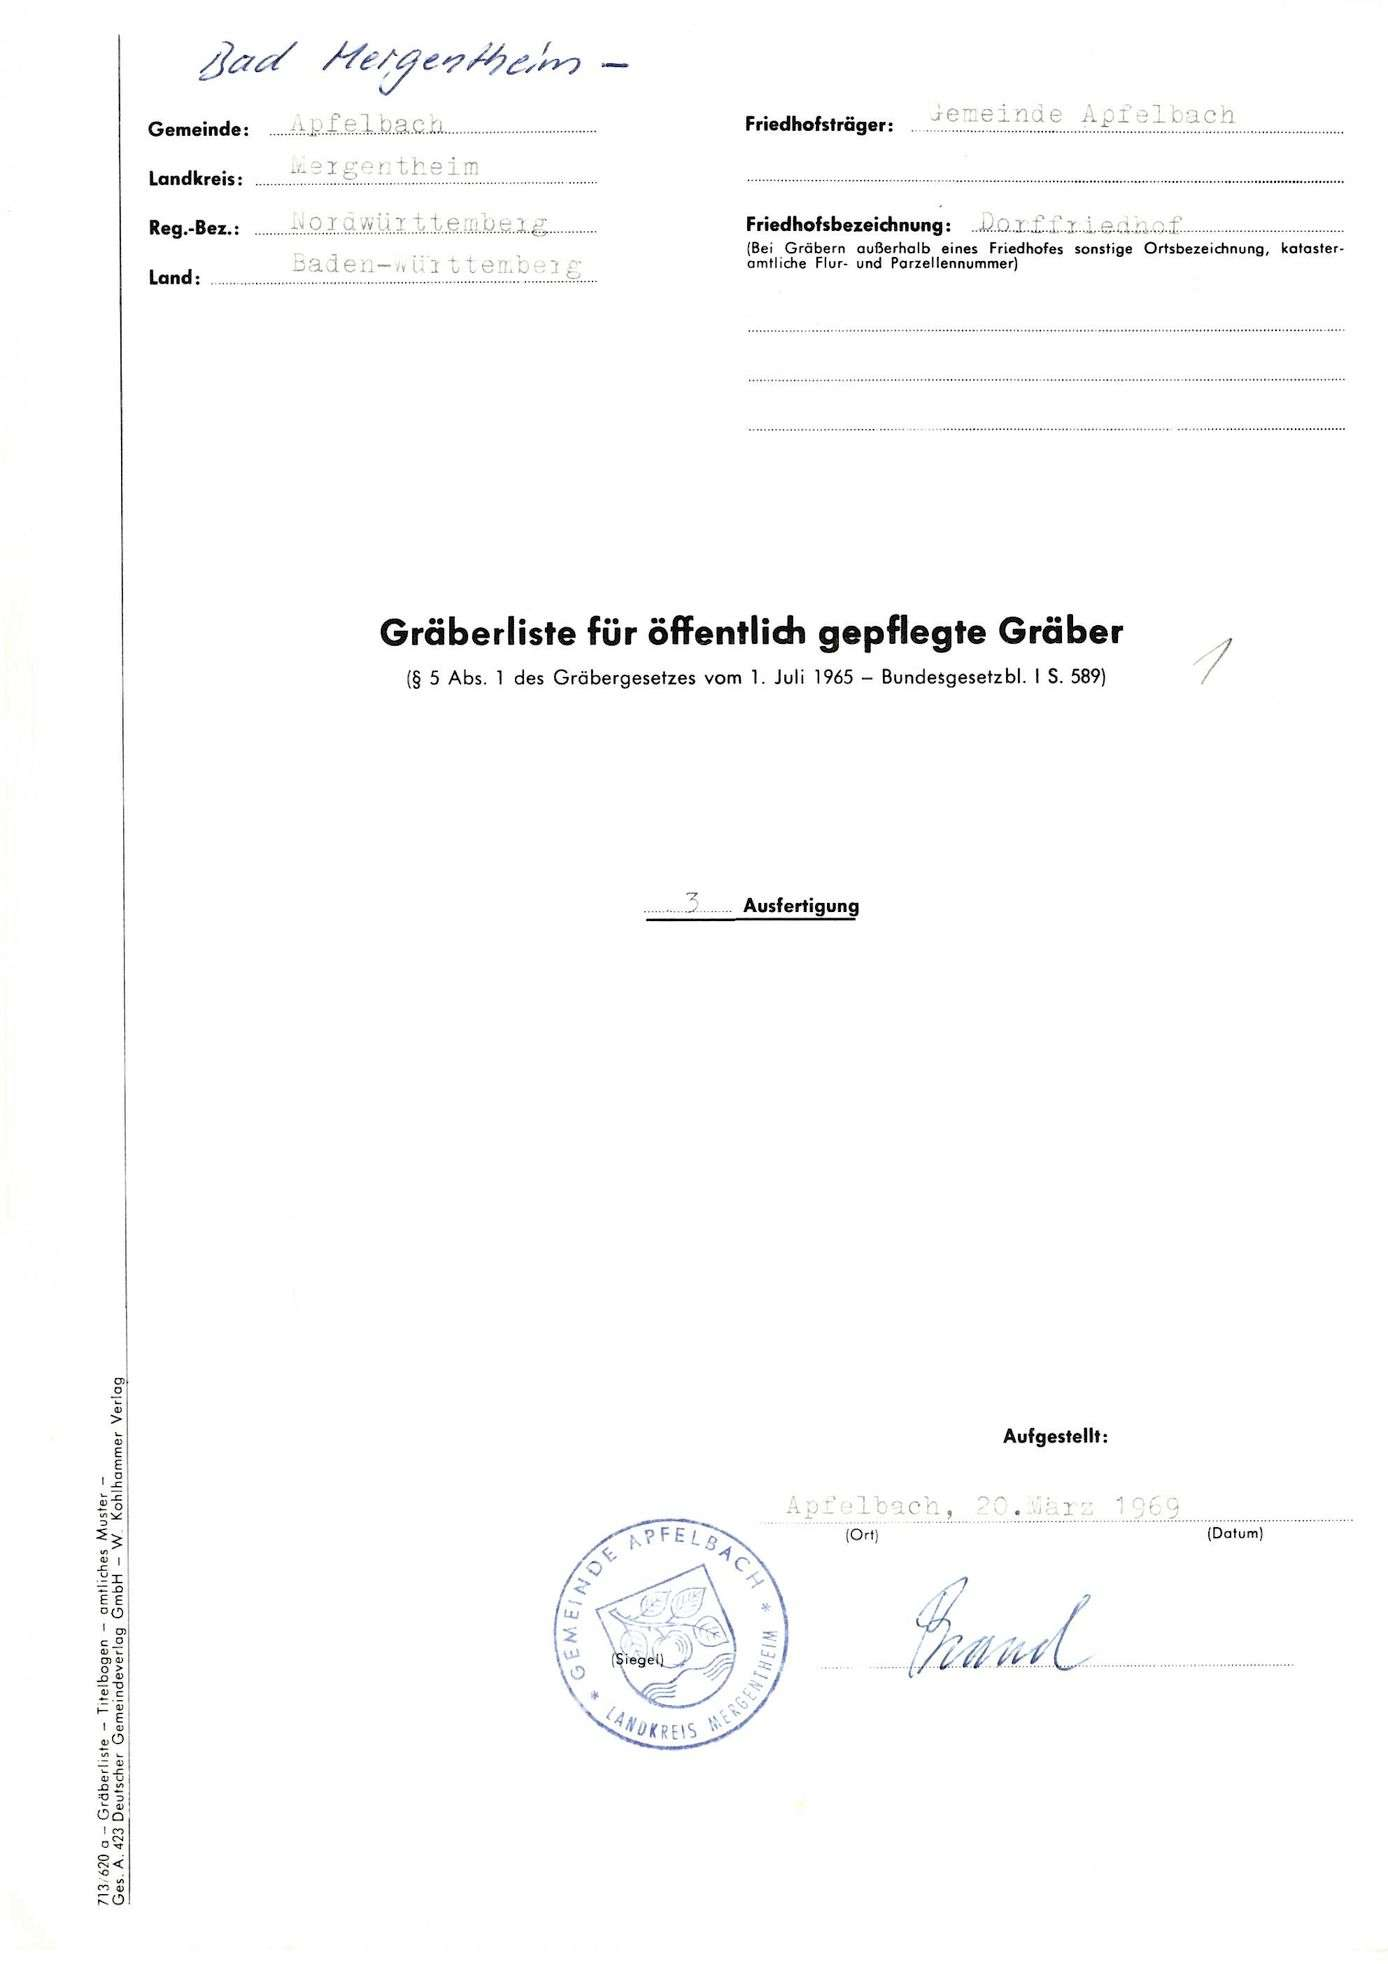 Apfelbach, Bild 1